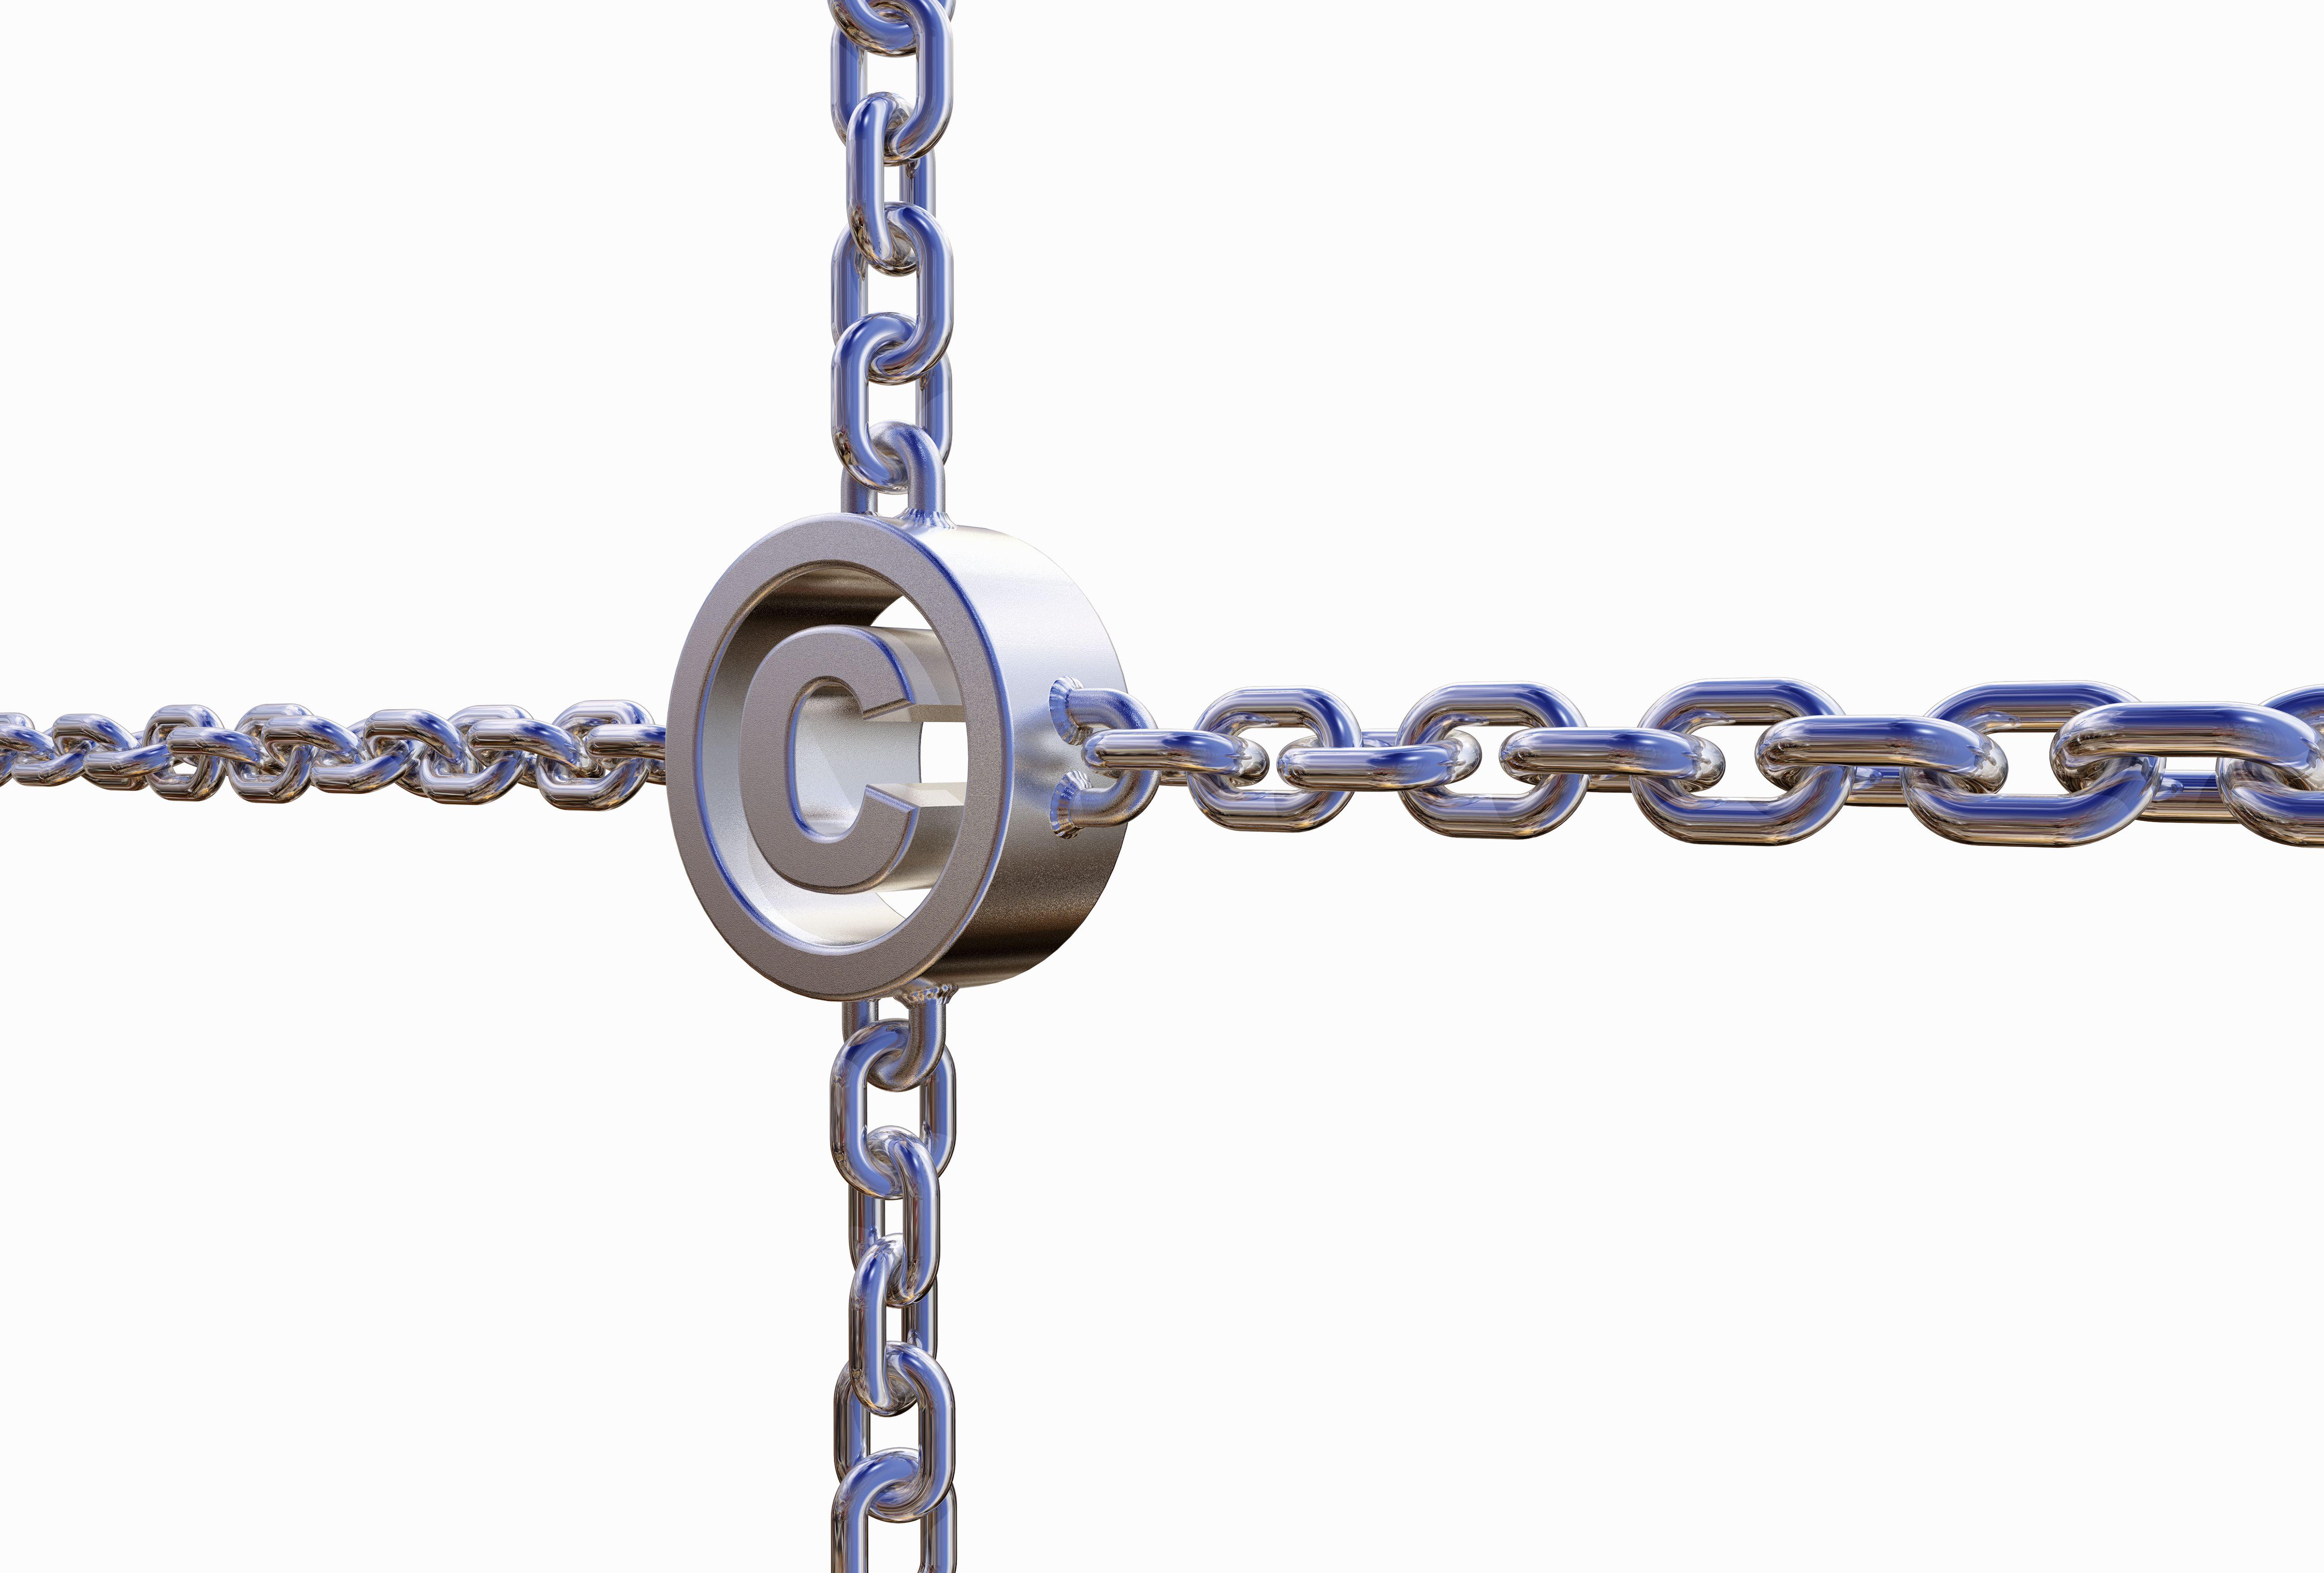 5 legal advantages of registering a copyright biocorpaavc